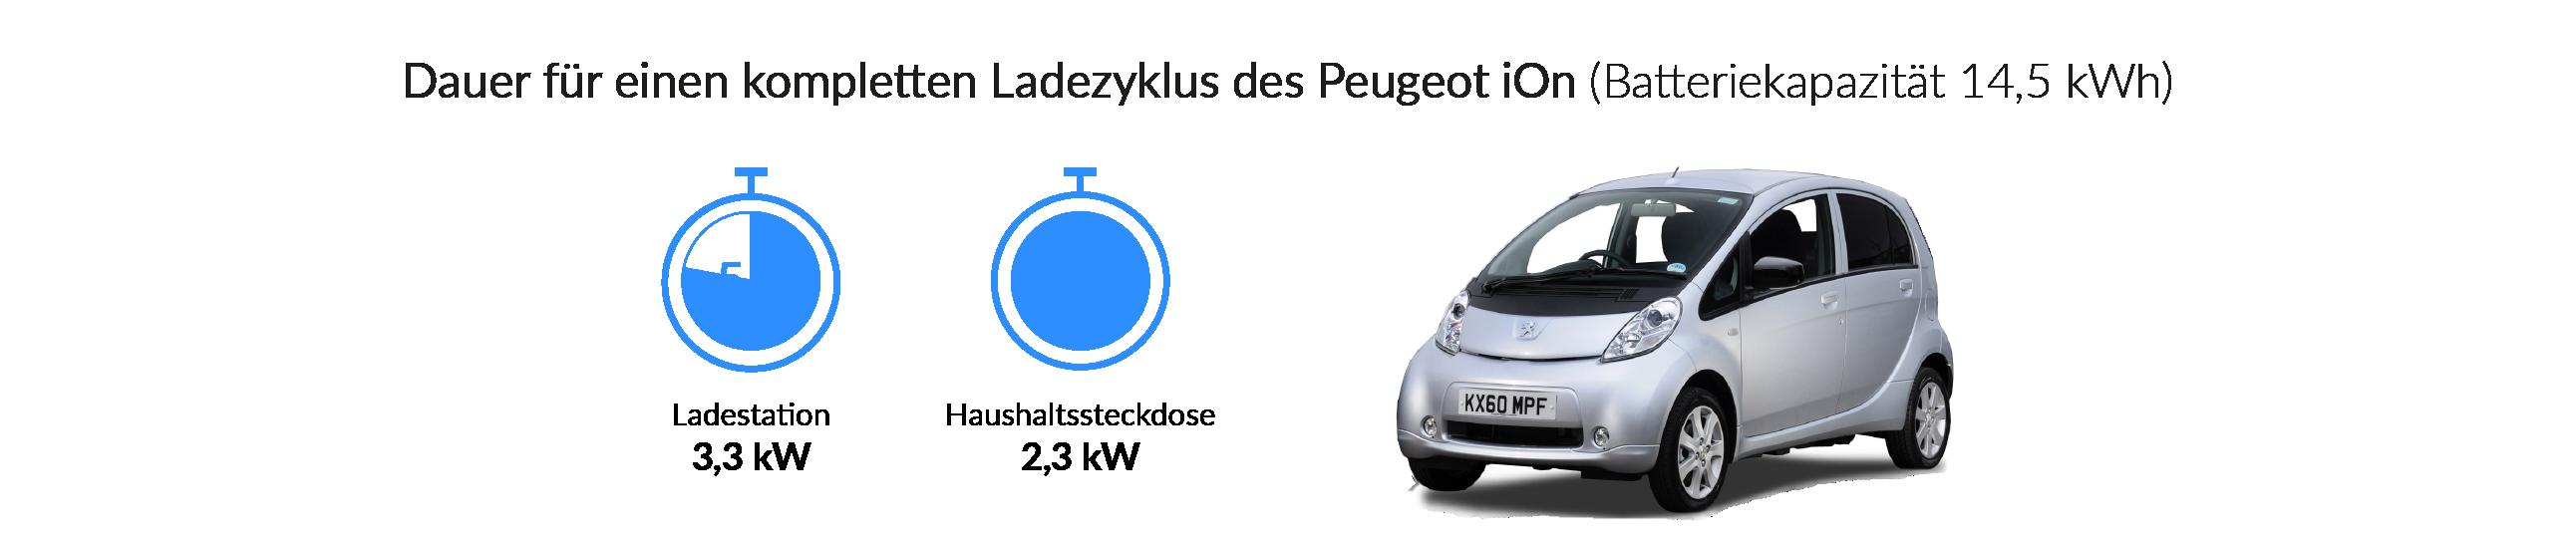 Ladezeiten des Peugeot iOn